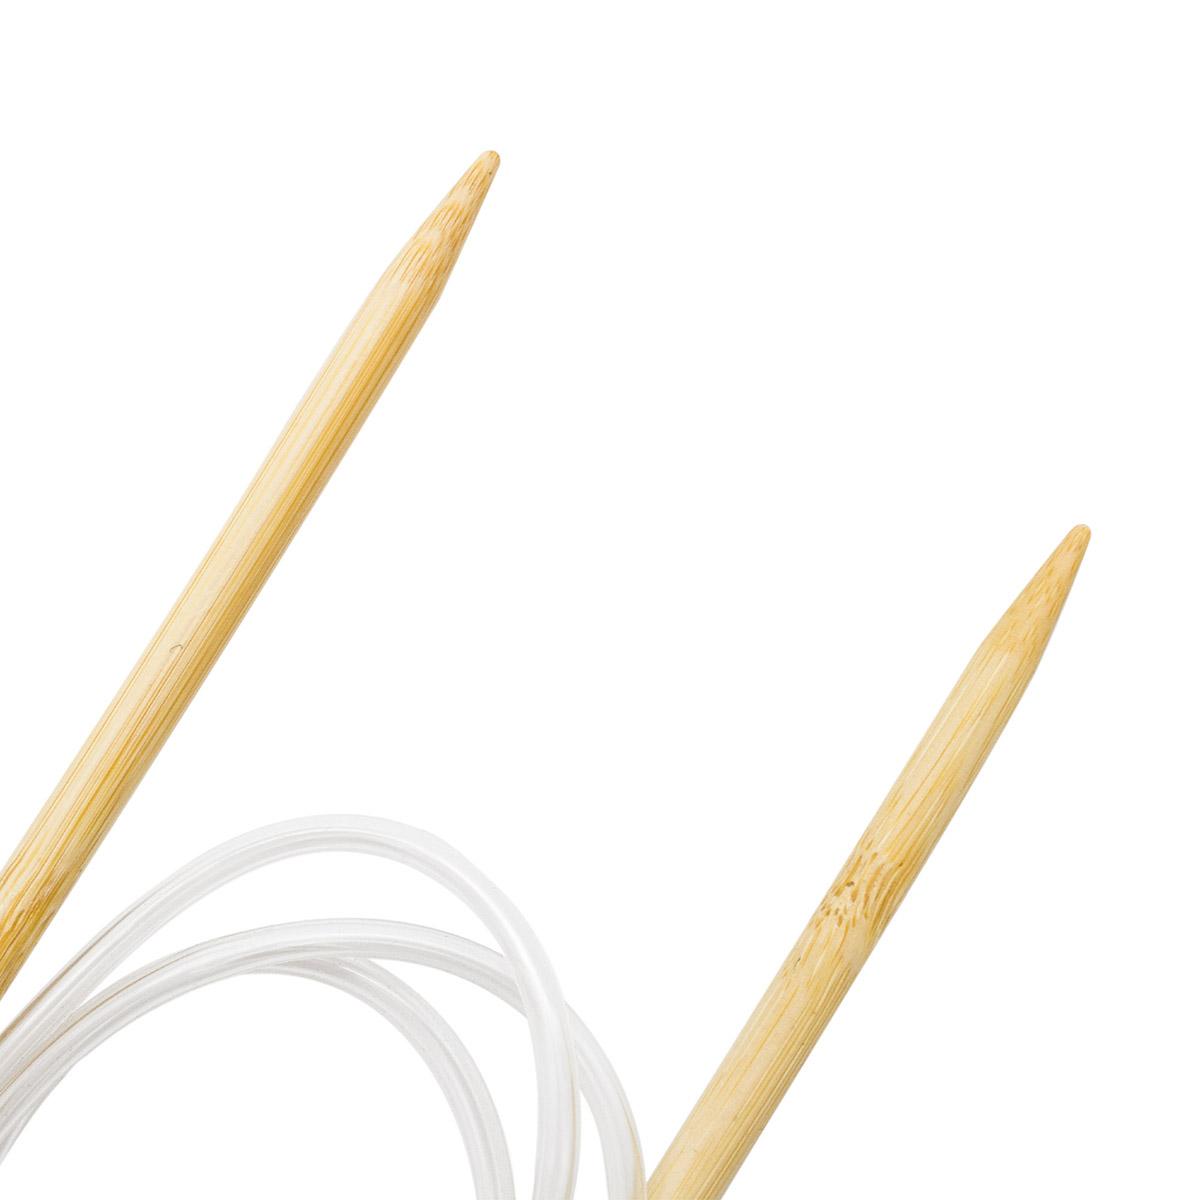 942170 Спицы круговые бамбук 100см, 7,0мм Hobby&Pro